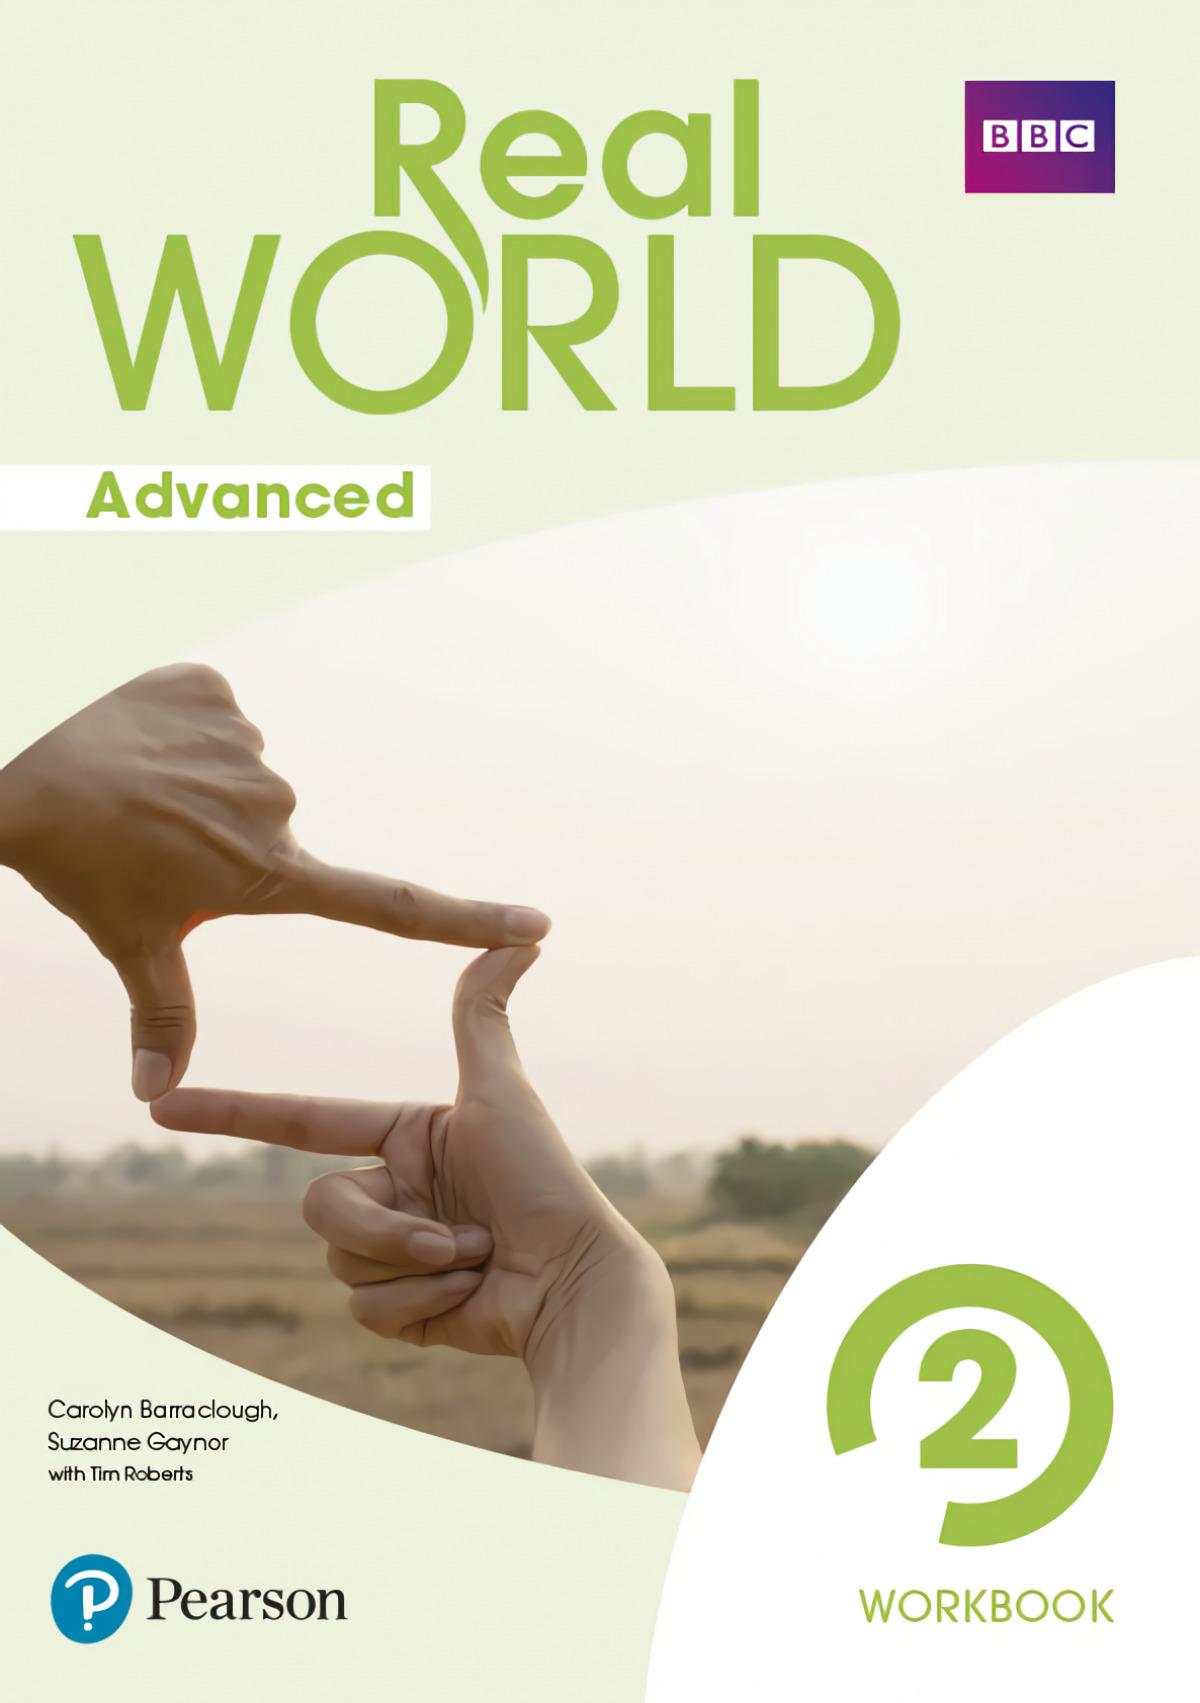 Real World Advanced 2 Workbook Print